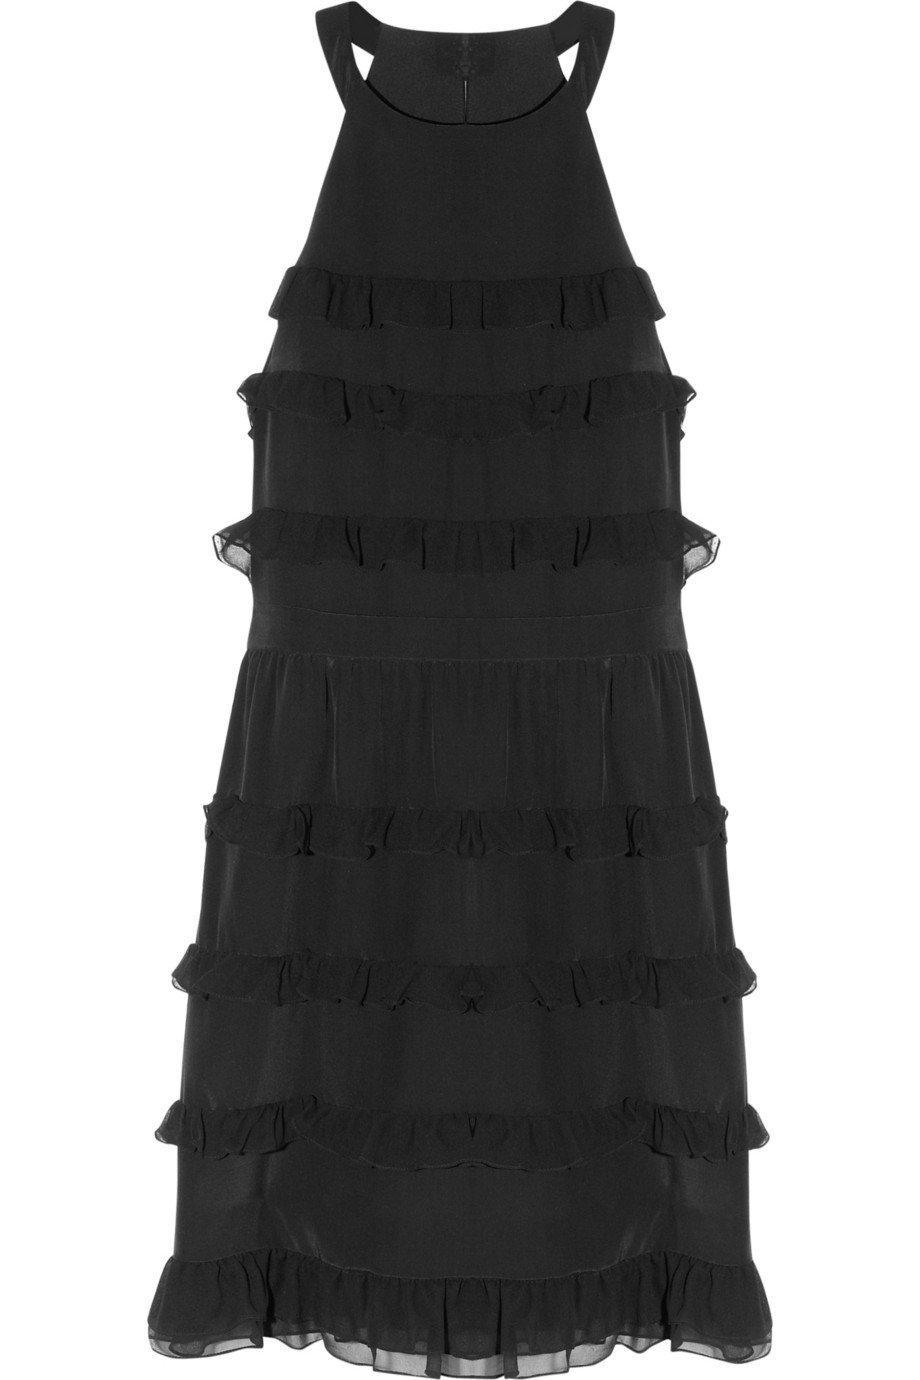 Ruffled silk mini dress by Tibi